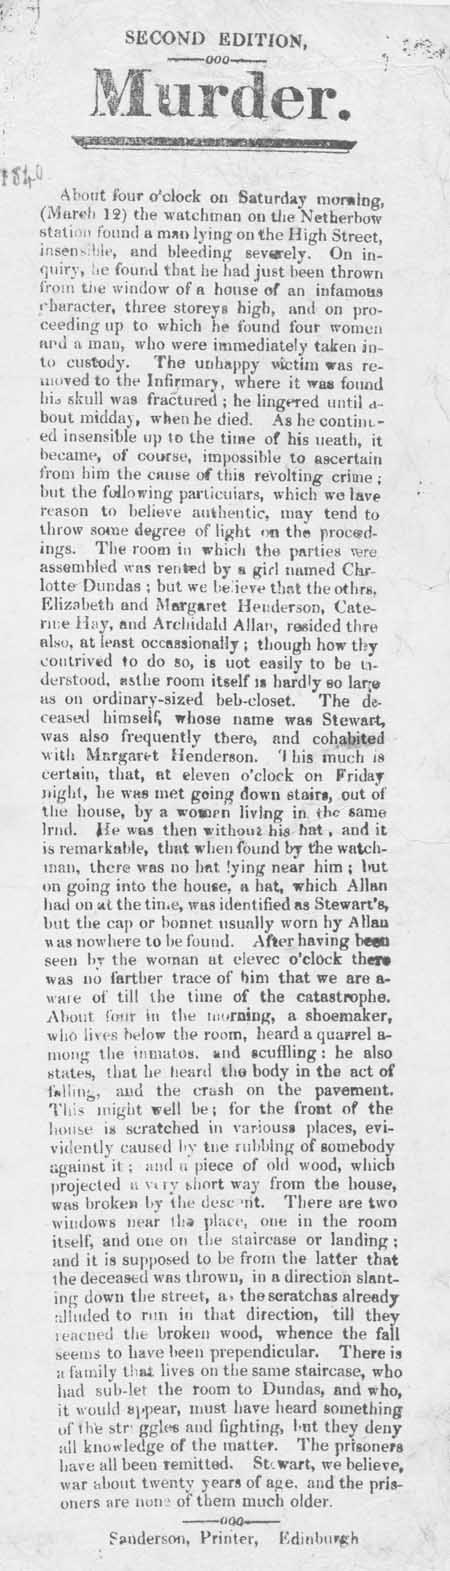 Broadside concerning the murder of a man in Edinburgh